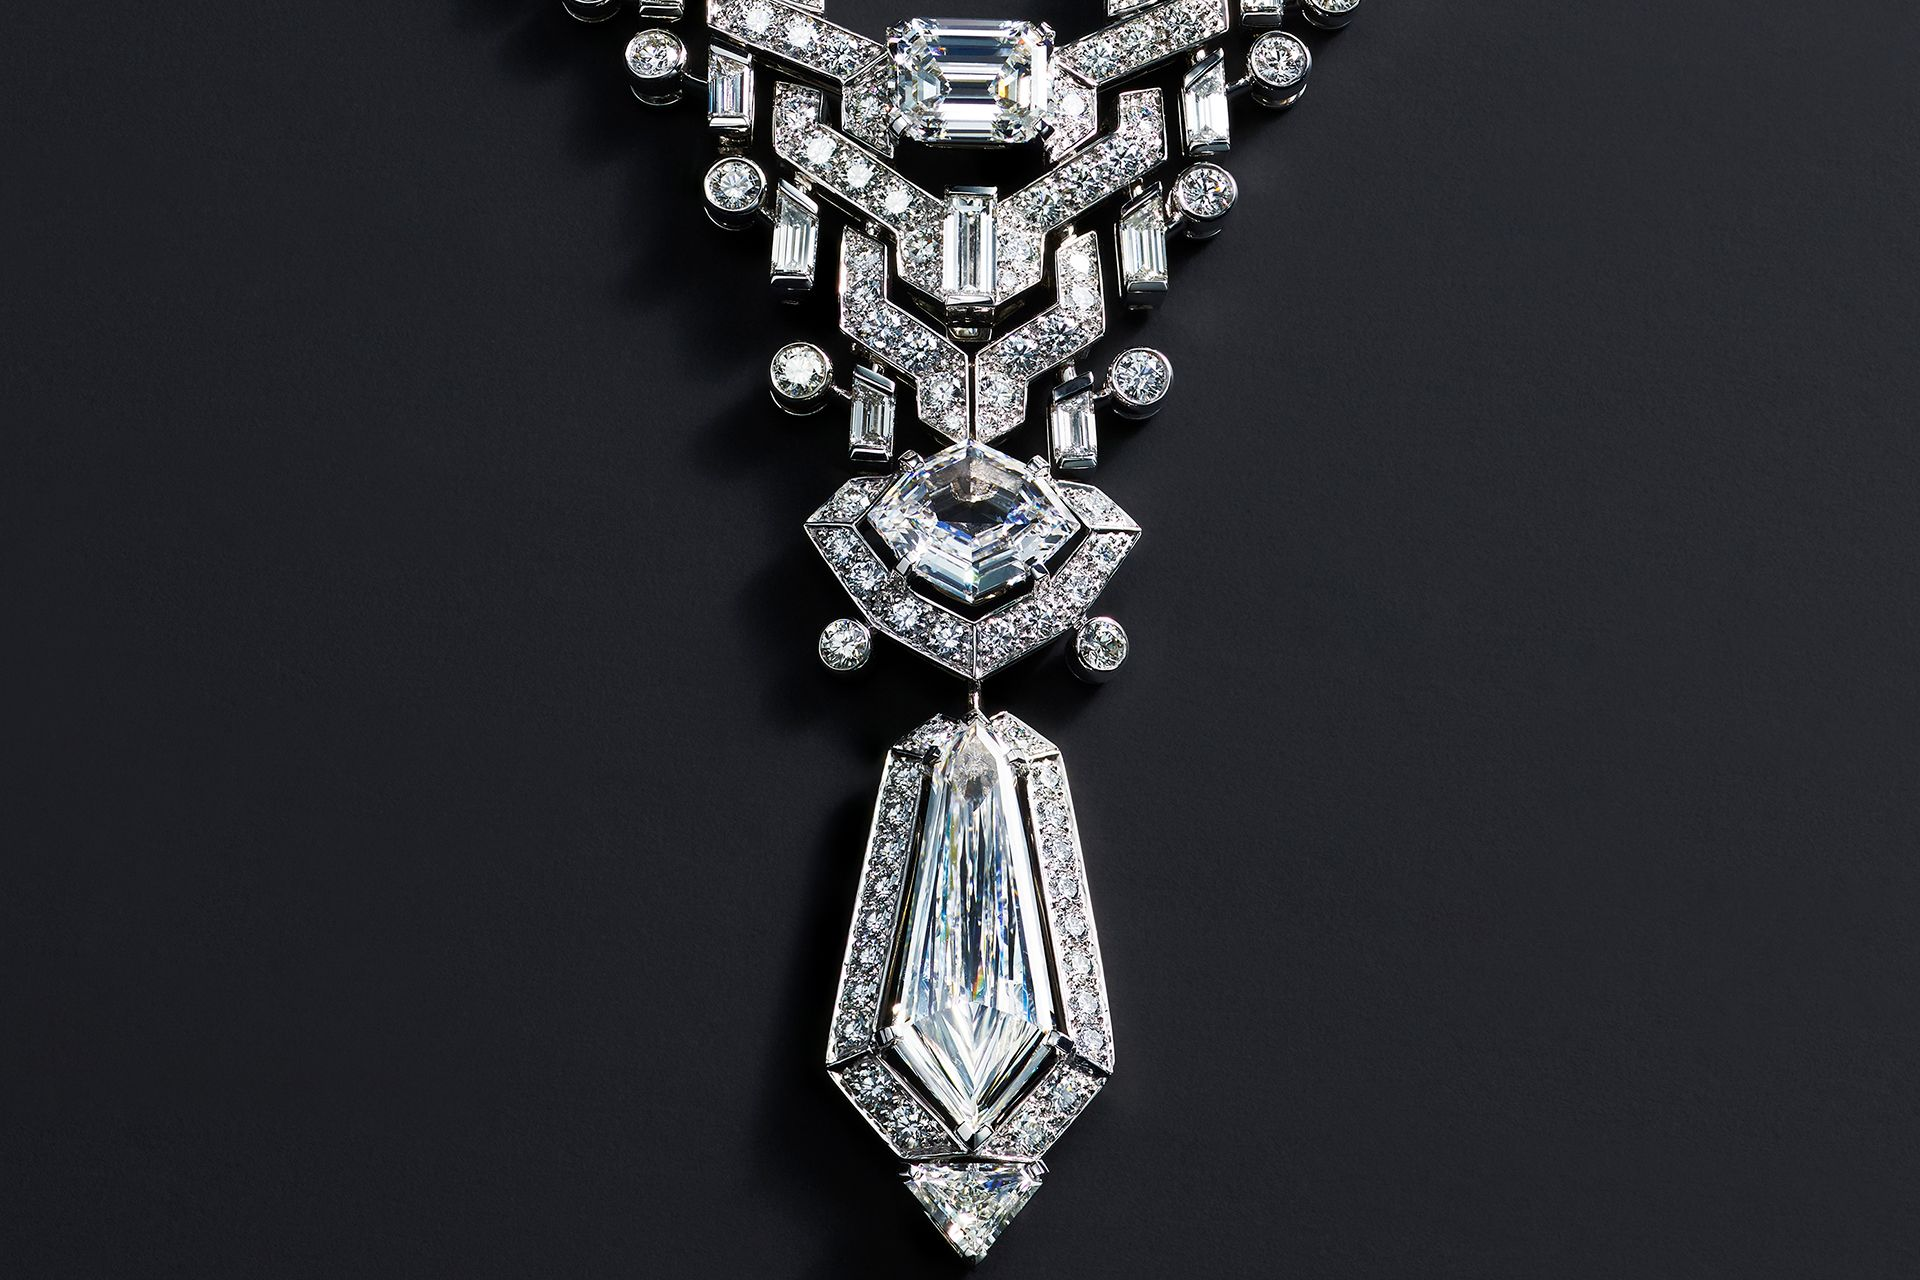 IN PHOTOS: Cartier's High Jewellery Collection, Sixième Sens